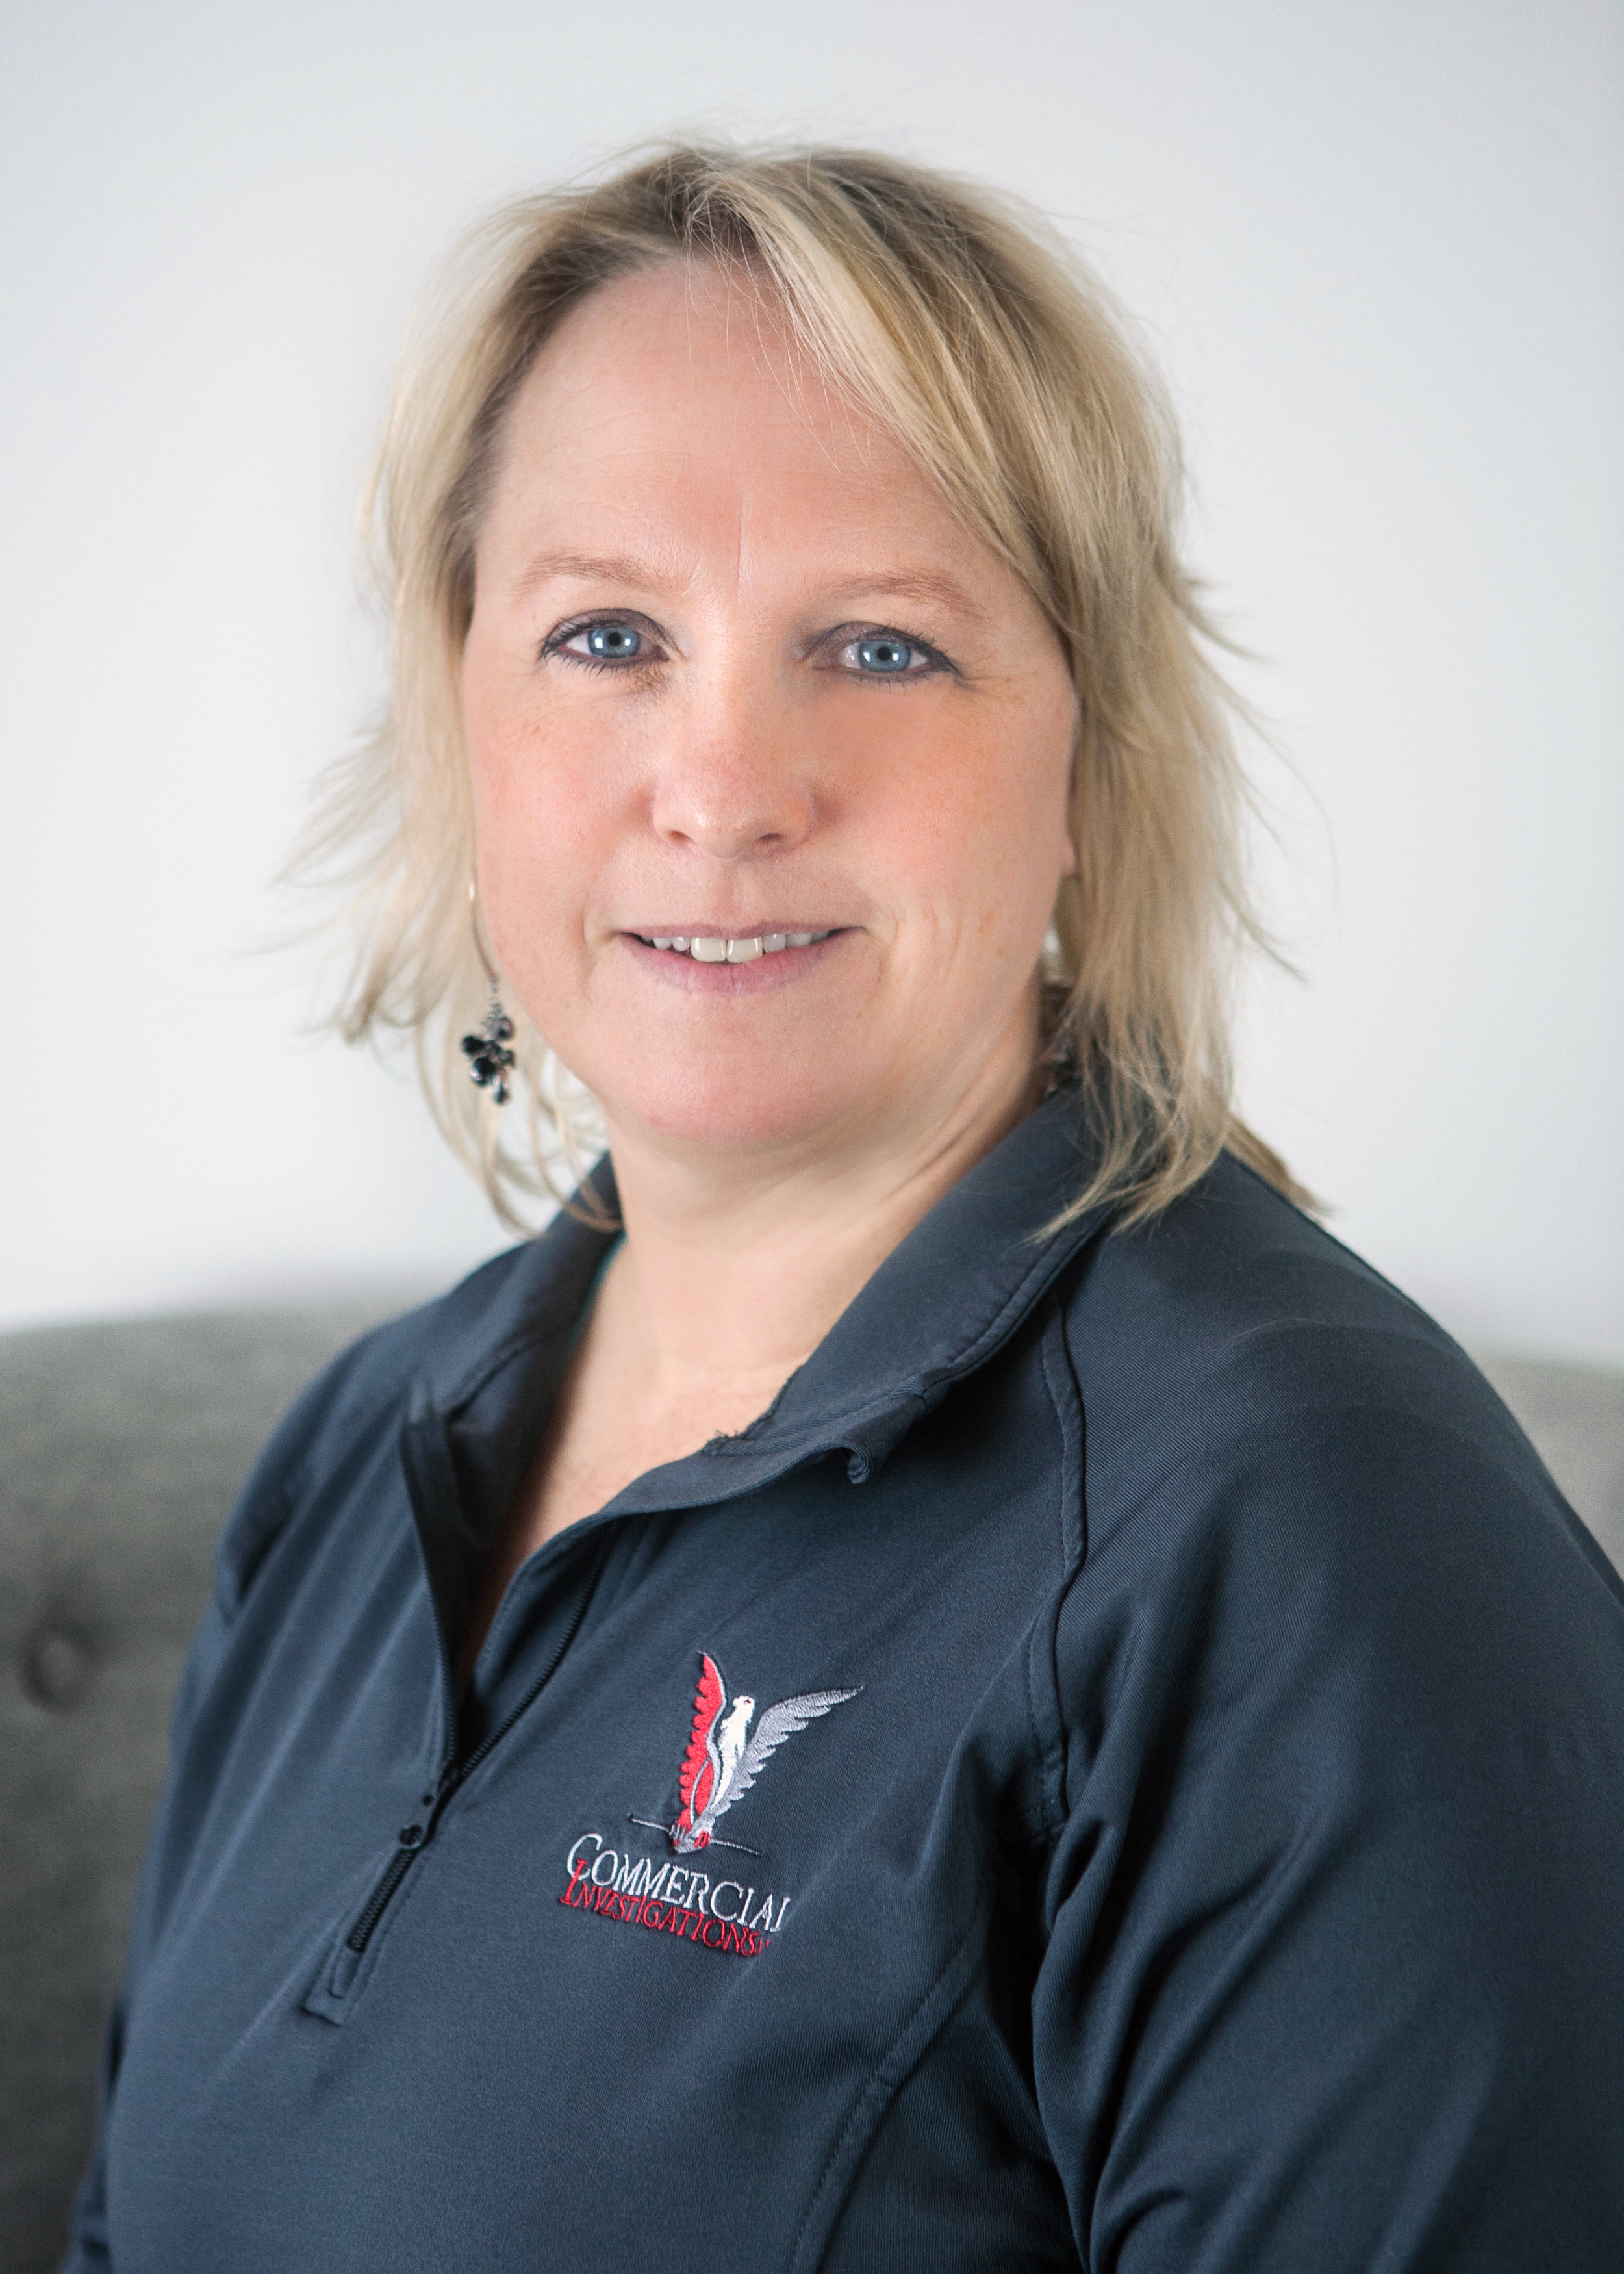 Michelle Pyan - PresidentCommercial Investigations LLC